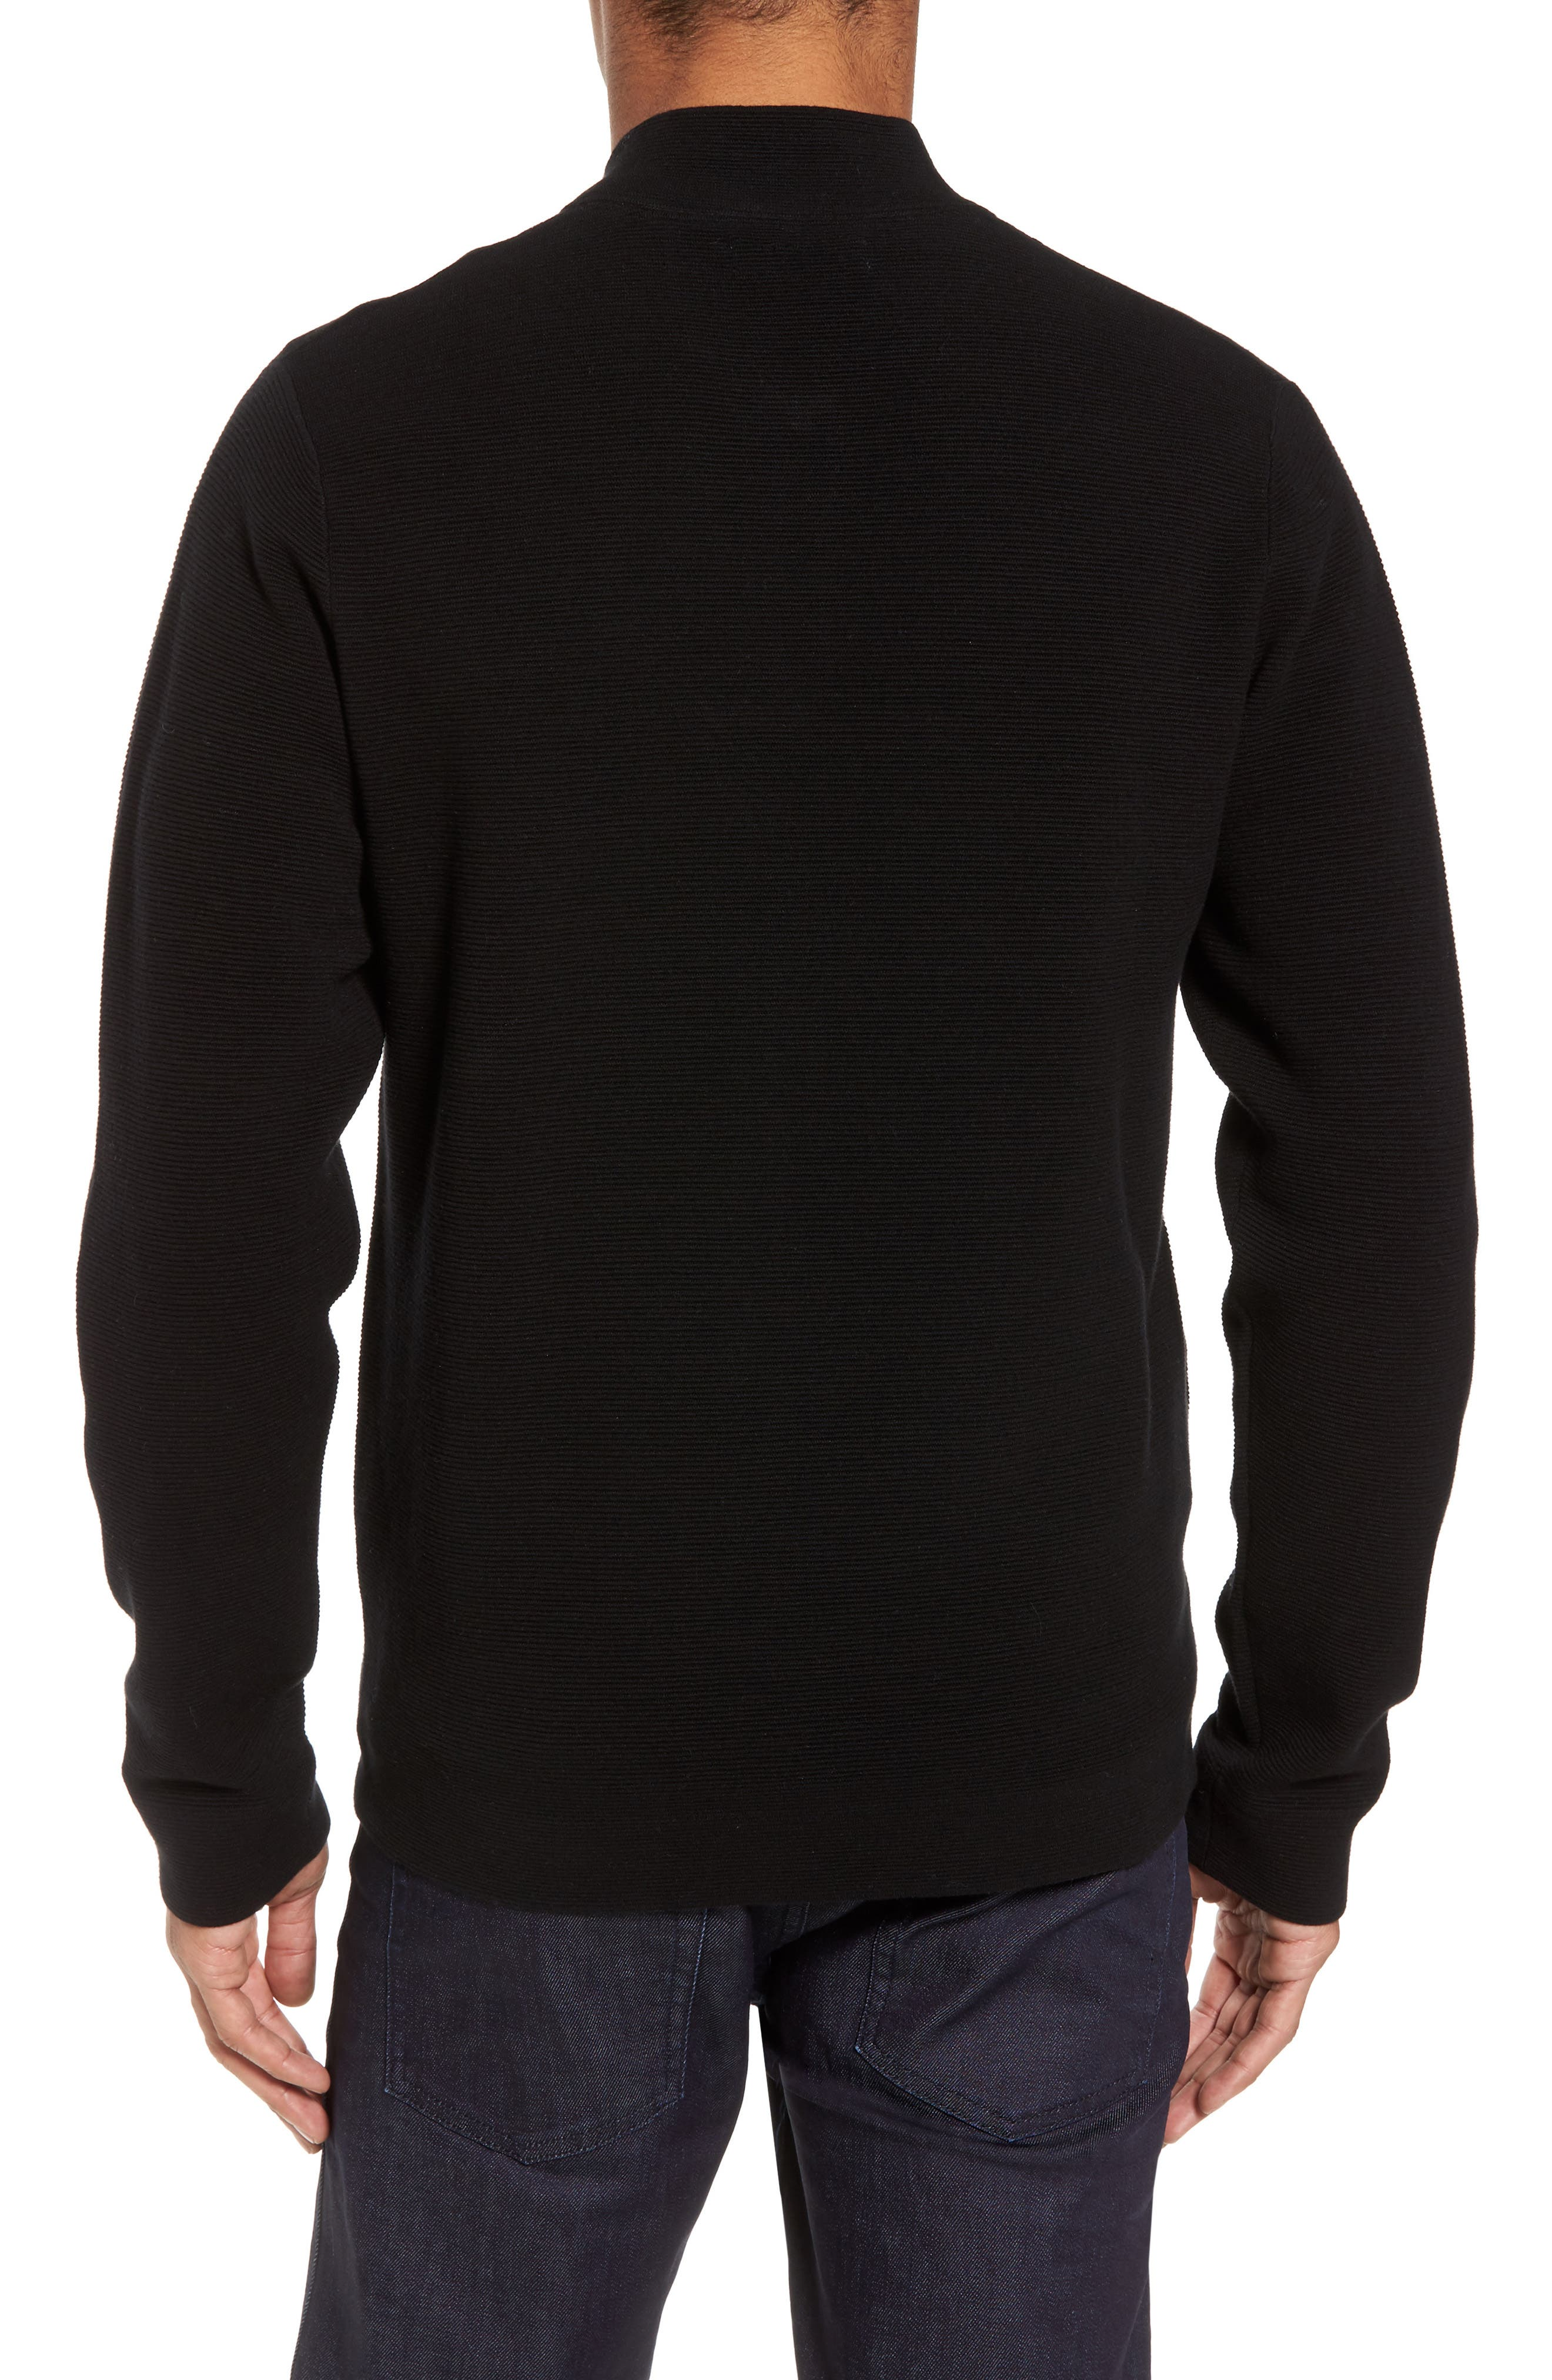 Ottoman Zip Cardigan,                             Alternate thumbnail 2, color,                             Black